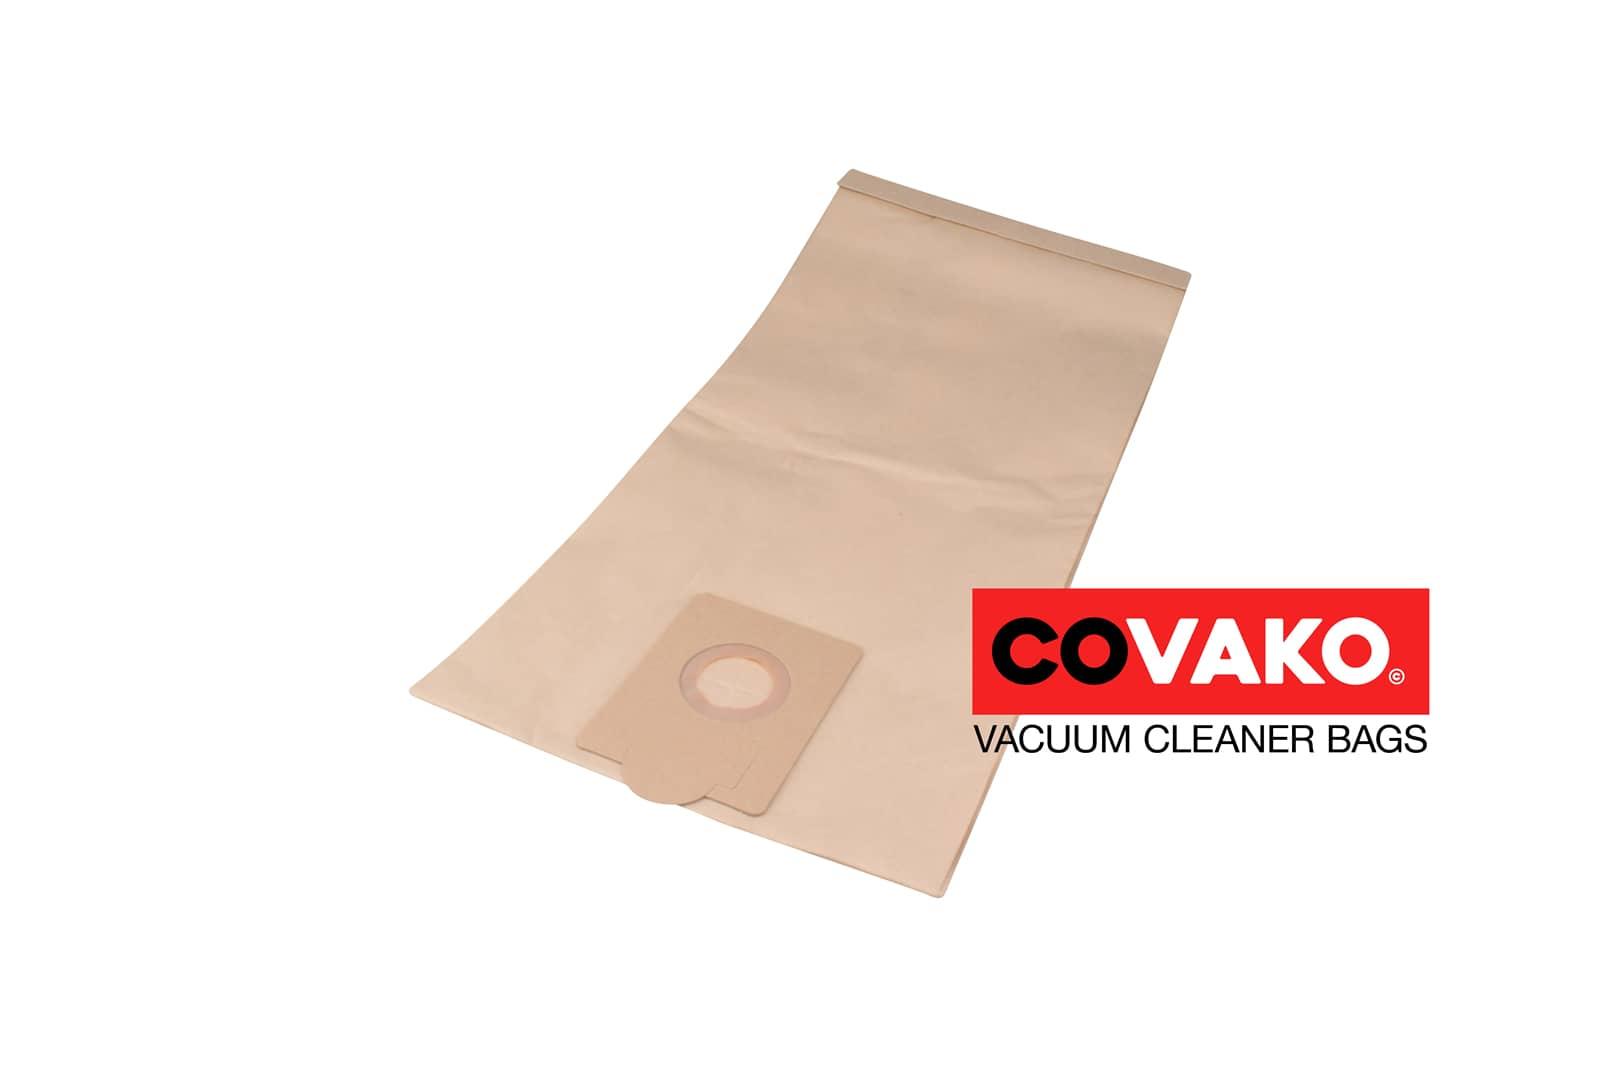 Fimap FV 30 / Papier - Fimap stofzuigerzakken